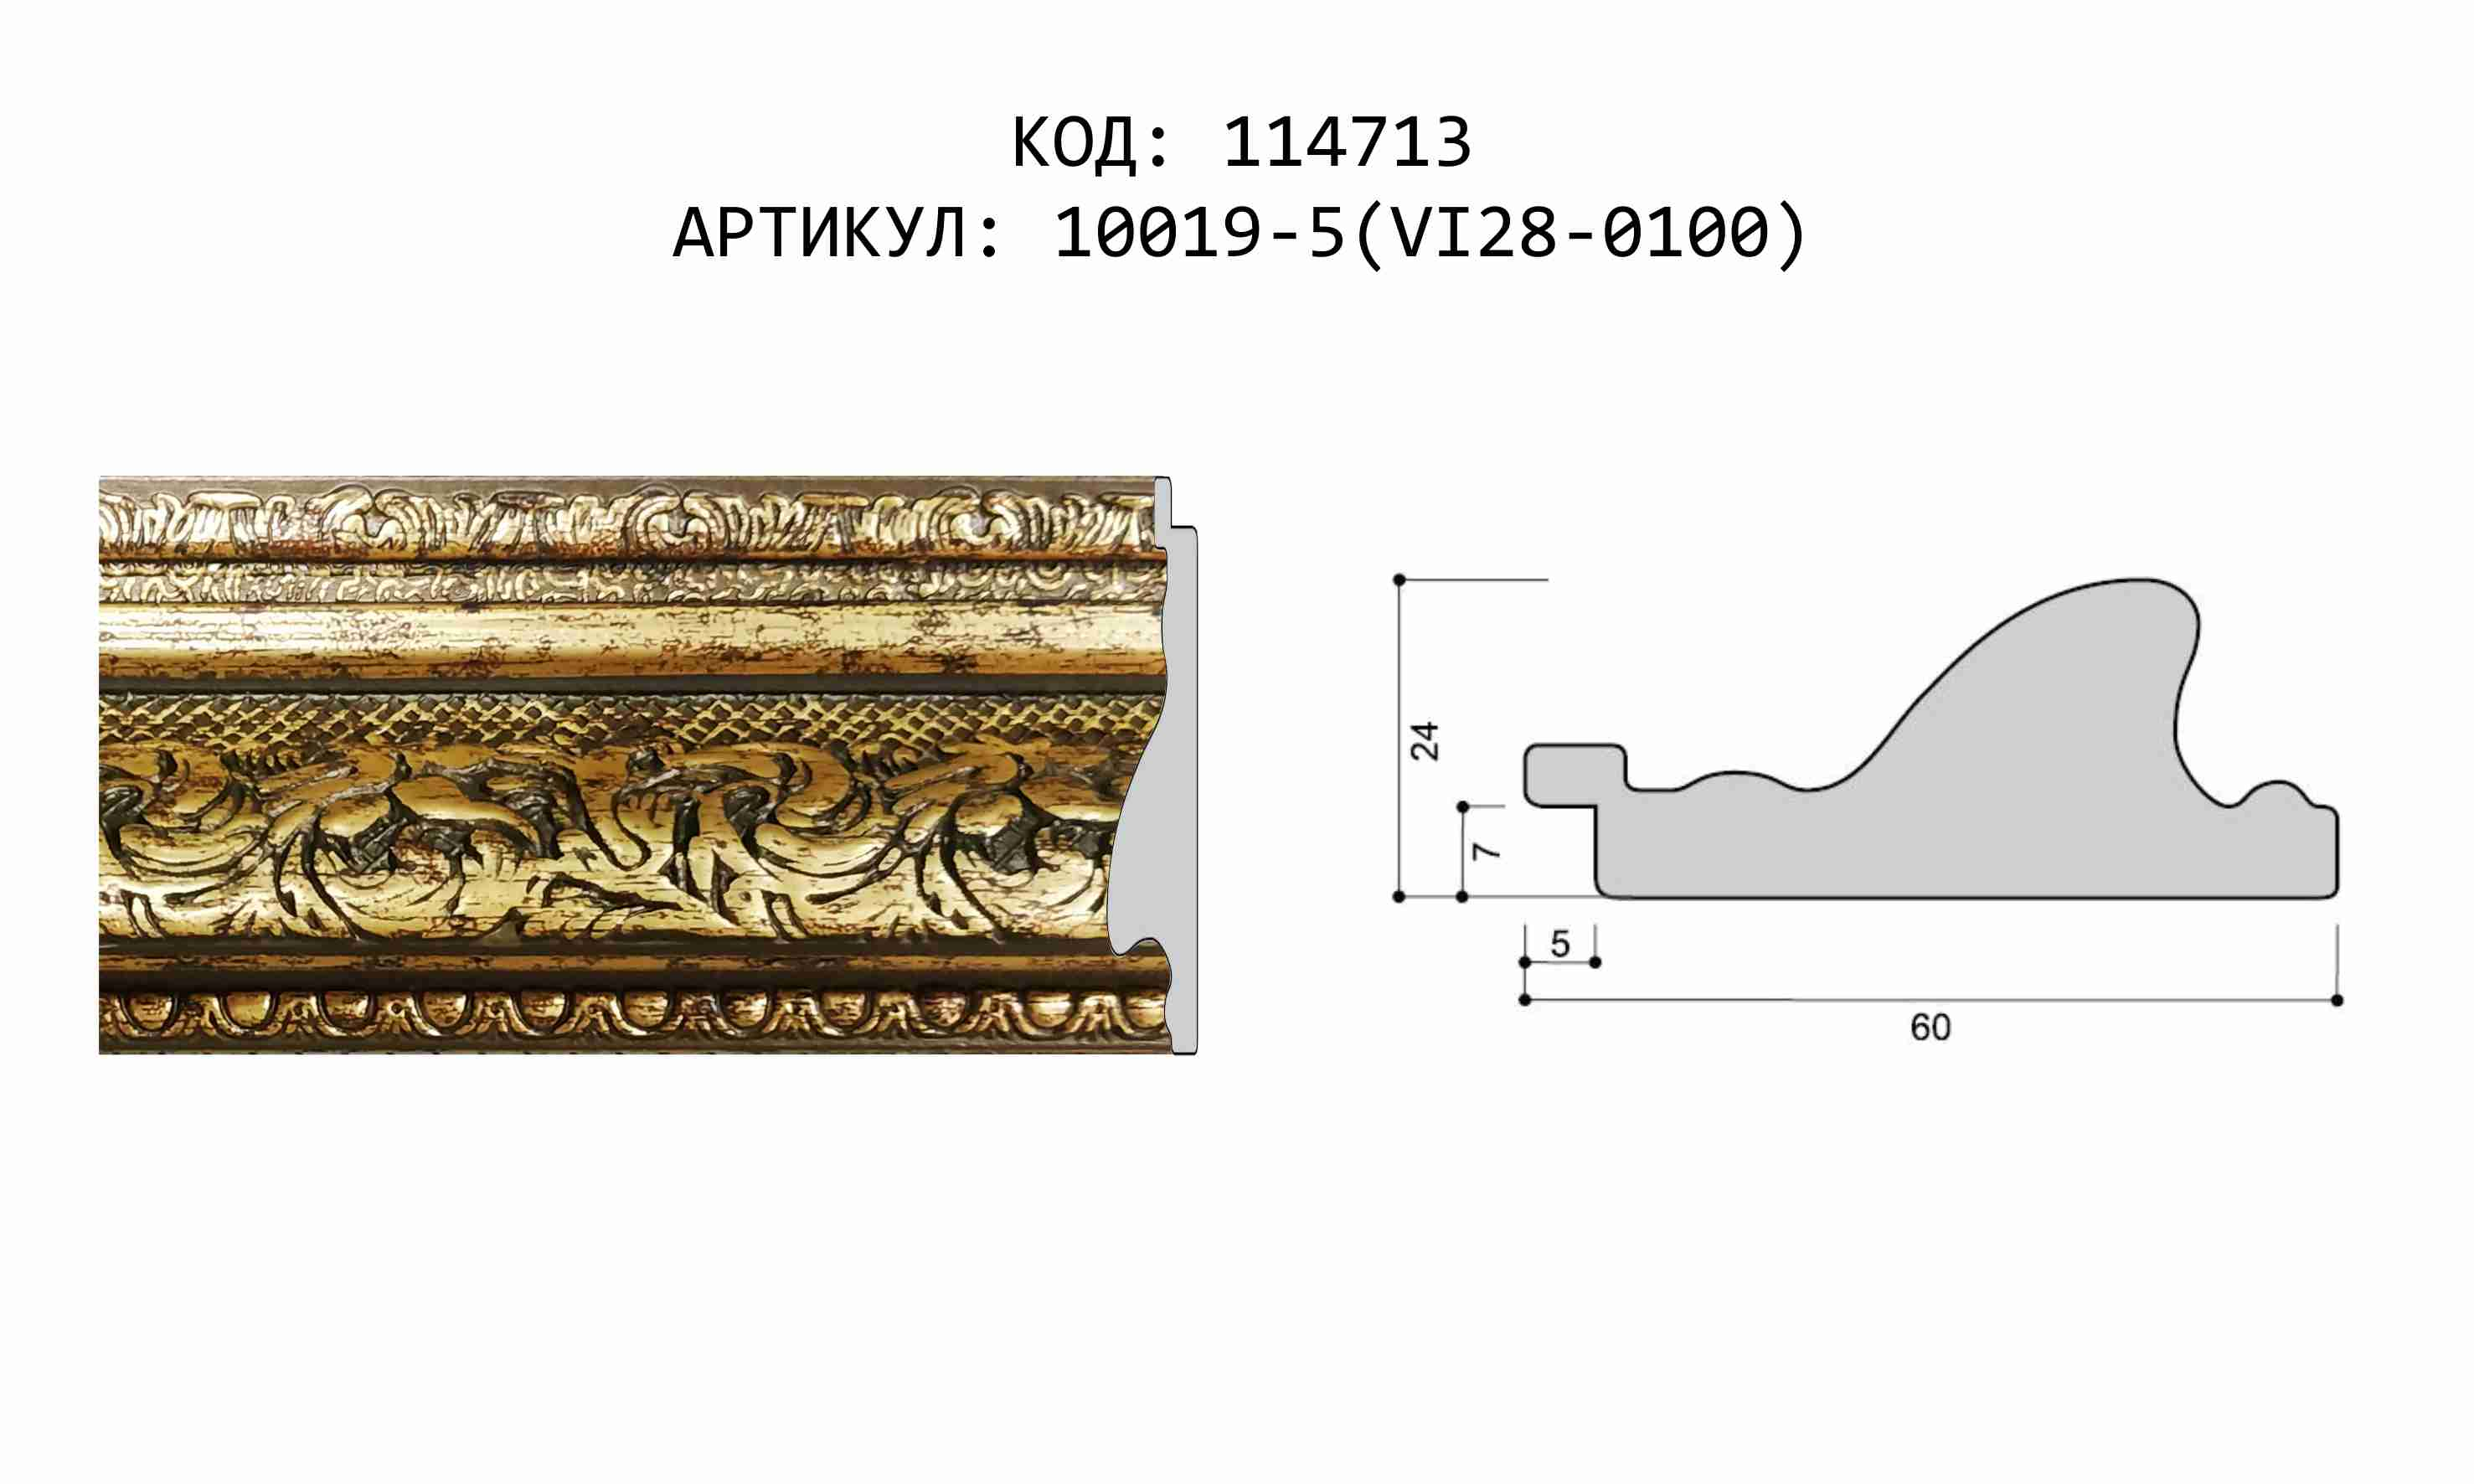 Артикул: 10019-5 (VI28-0100)